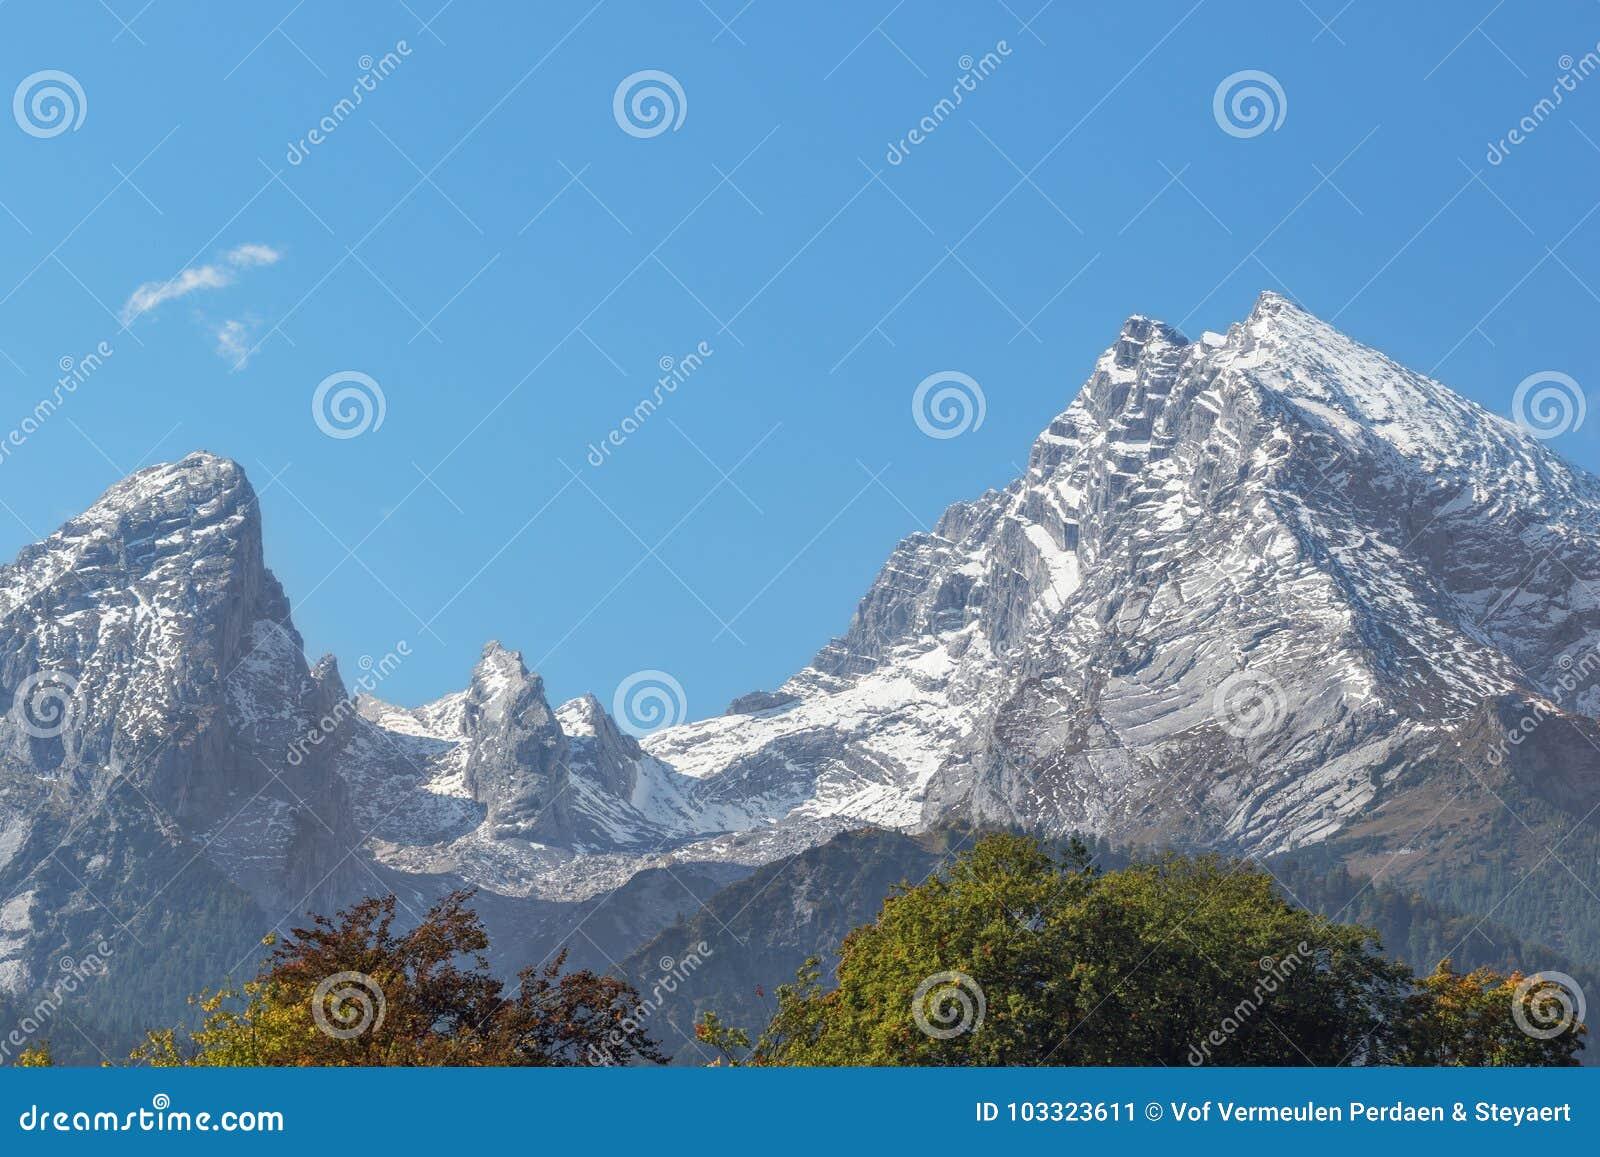 Aperçu du massif de Watzmann